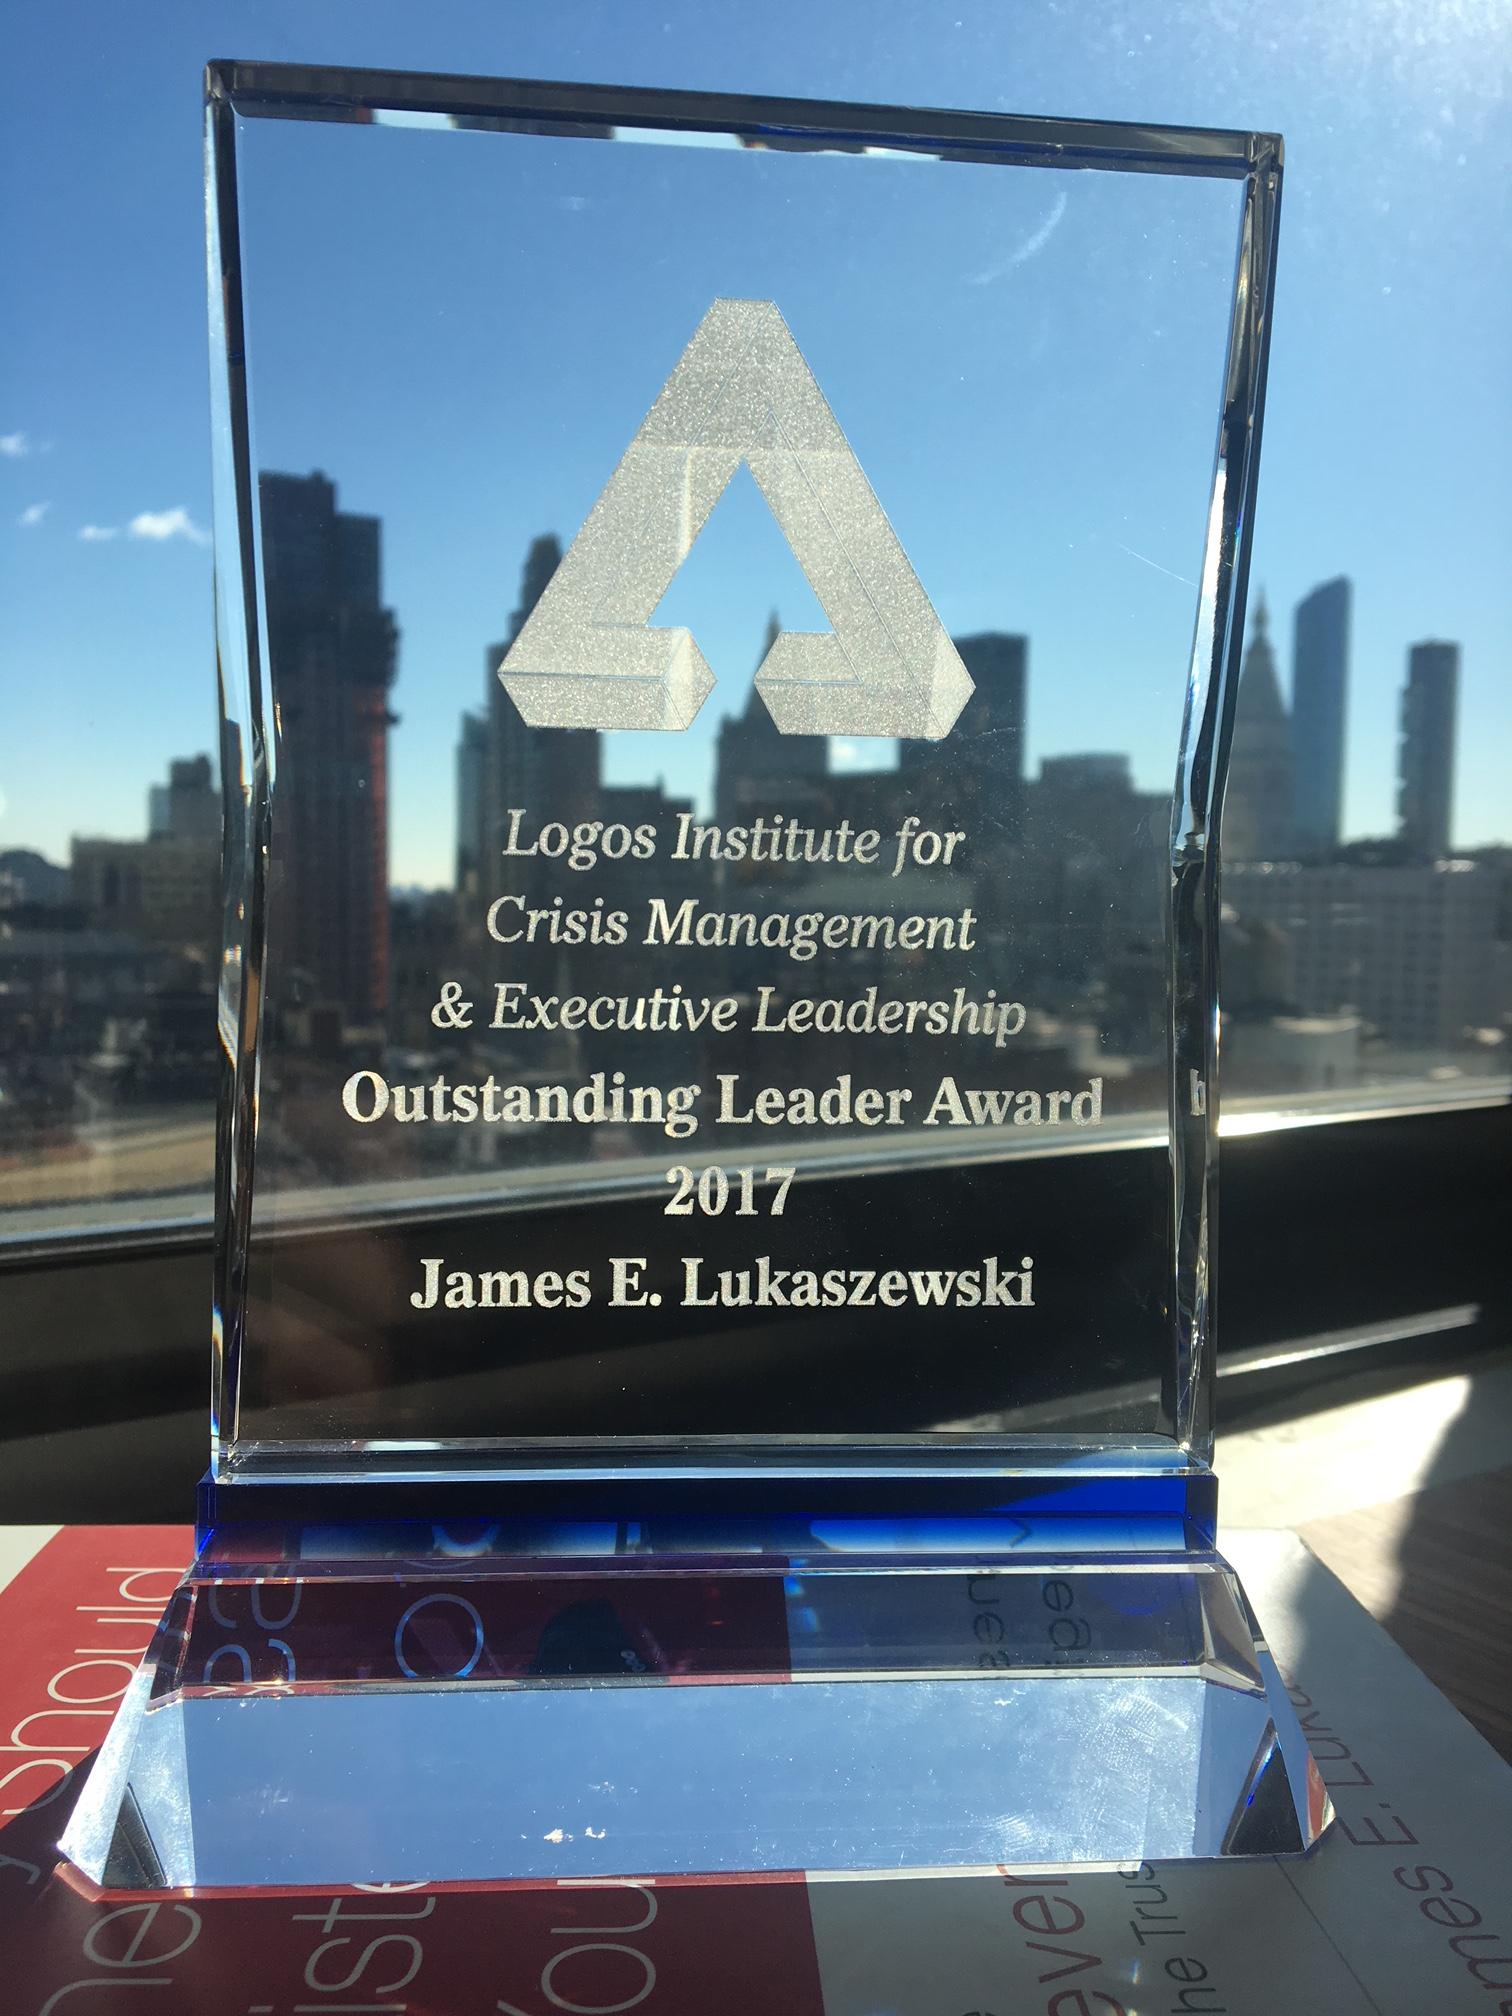 Logos Institute for Crisis Management & Executive Leadership Presents Inaugural Outstanding Leader Award to  James E. Lukaszewski